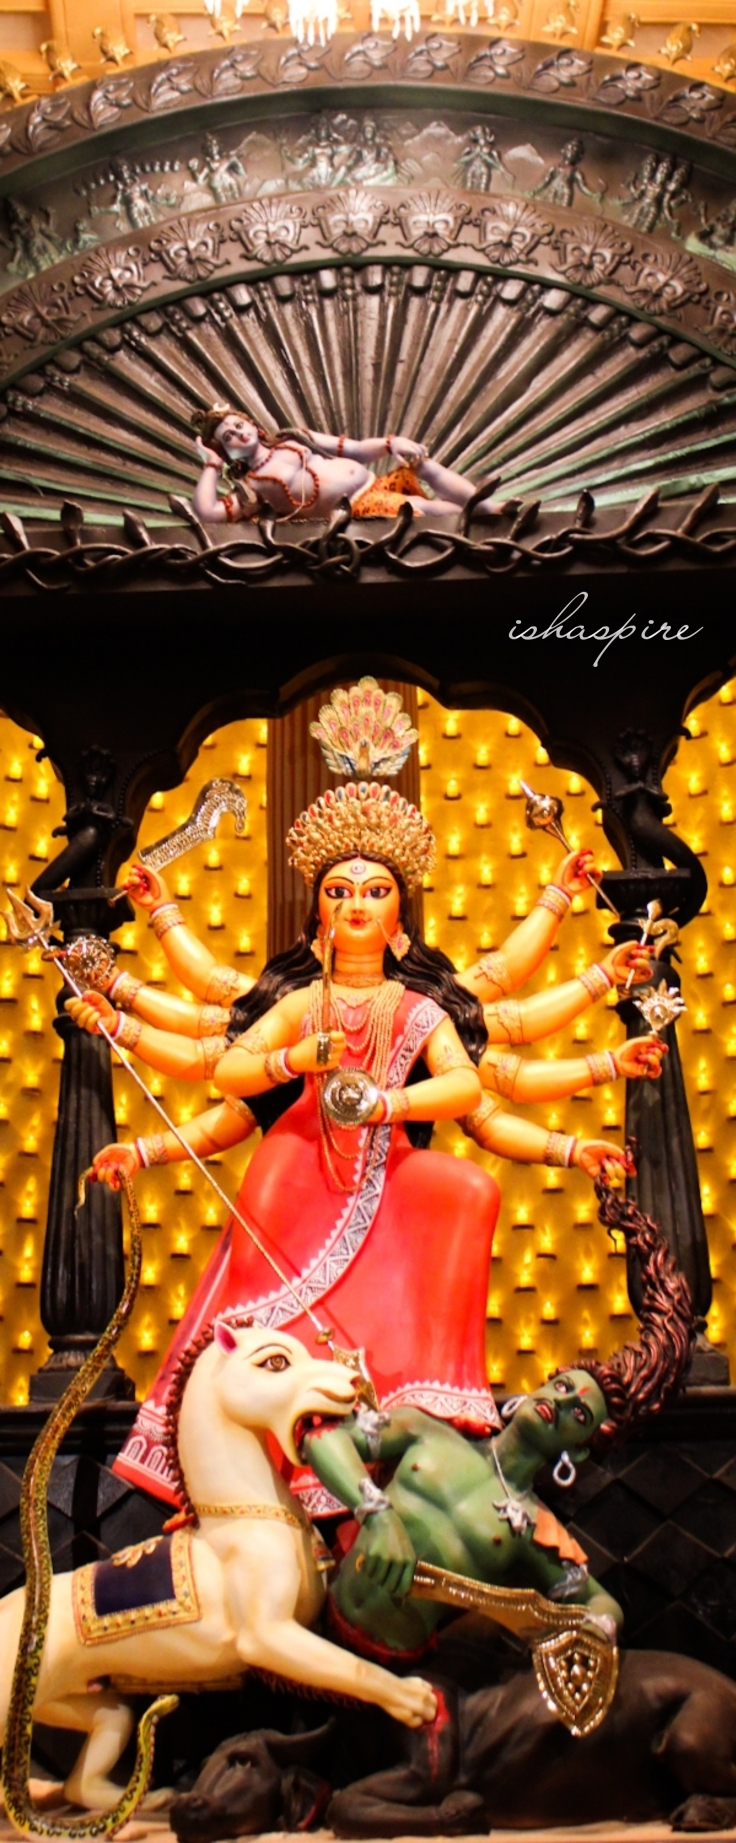 Chalchitra Thakur - Chetla Agrani Pujo 2019 - ishaspire